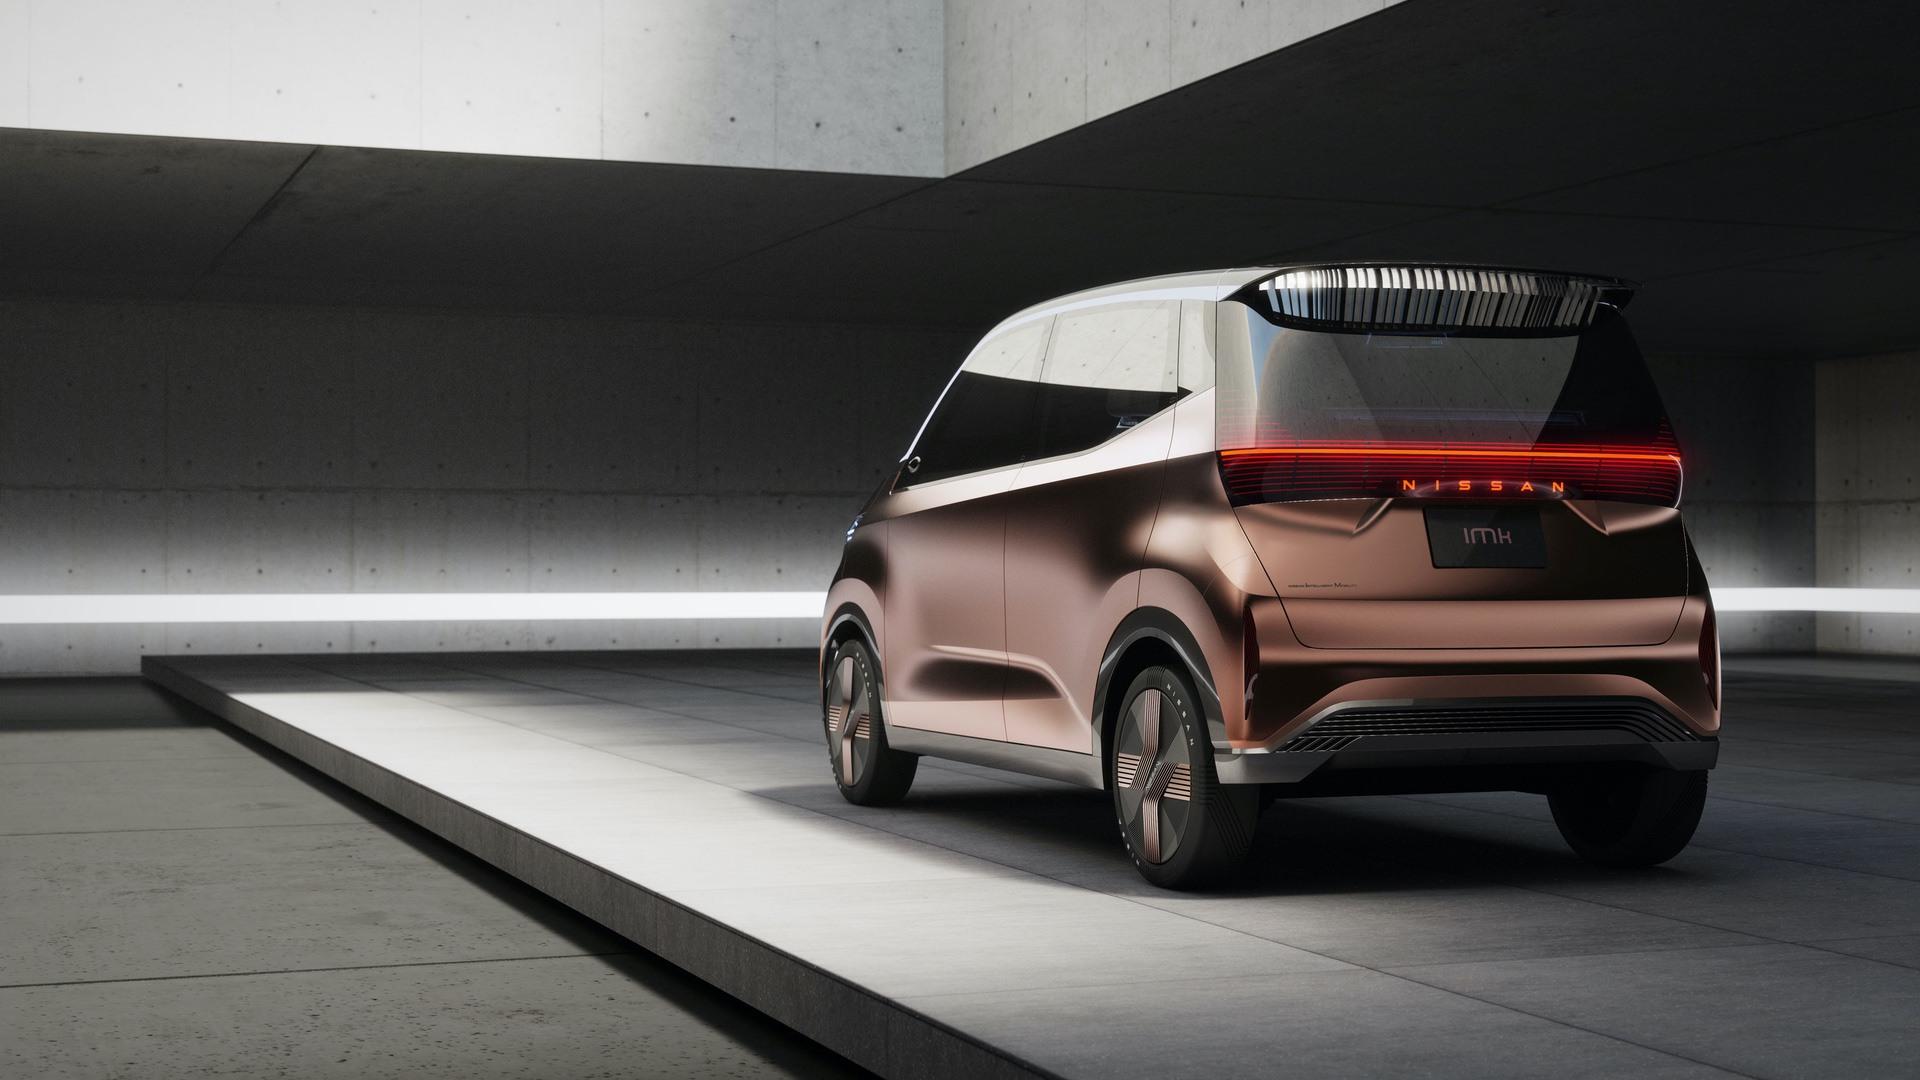 Nissan_IMk_Concept_0016